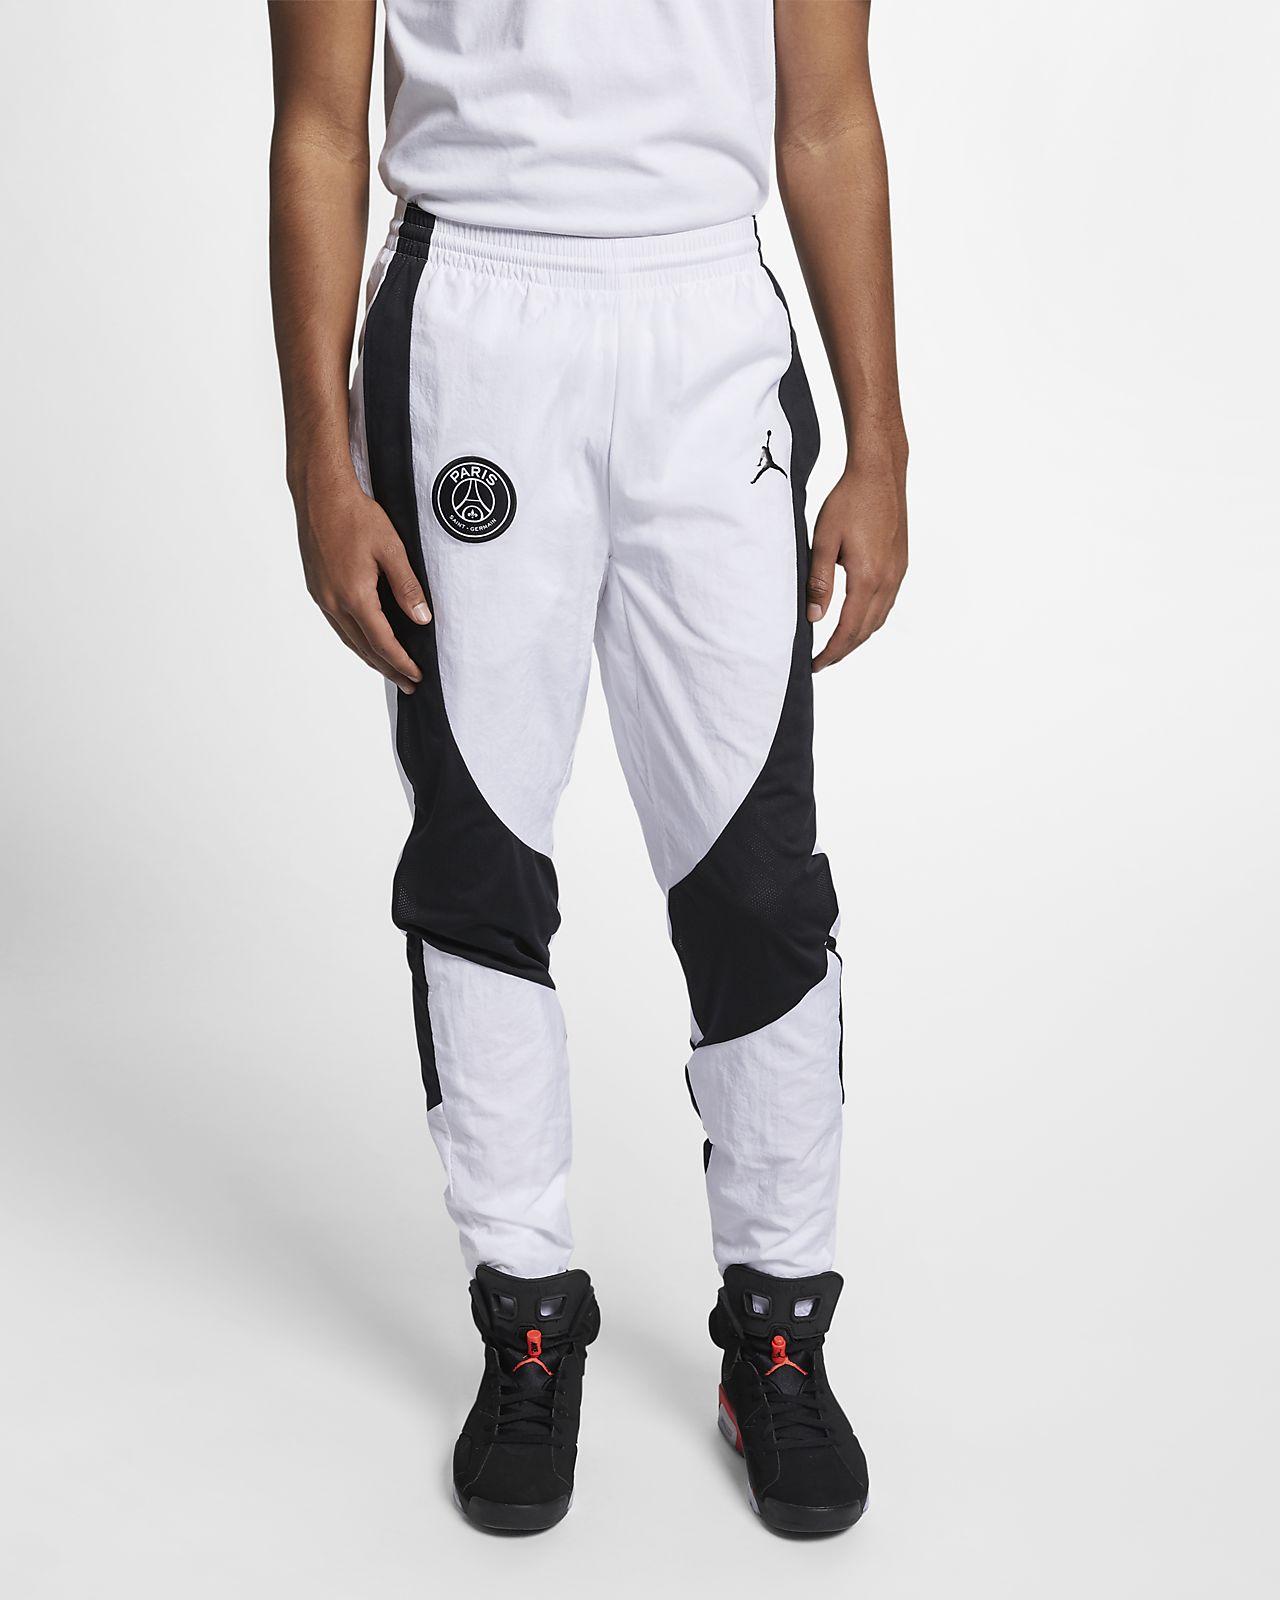 PSG AJ 1 Pantalón - Hombre